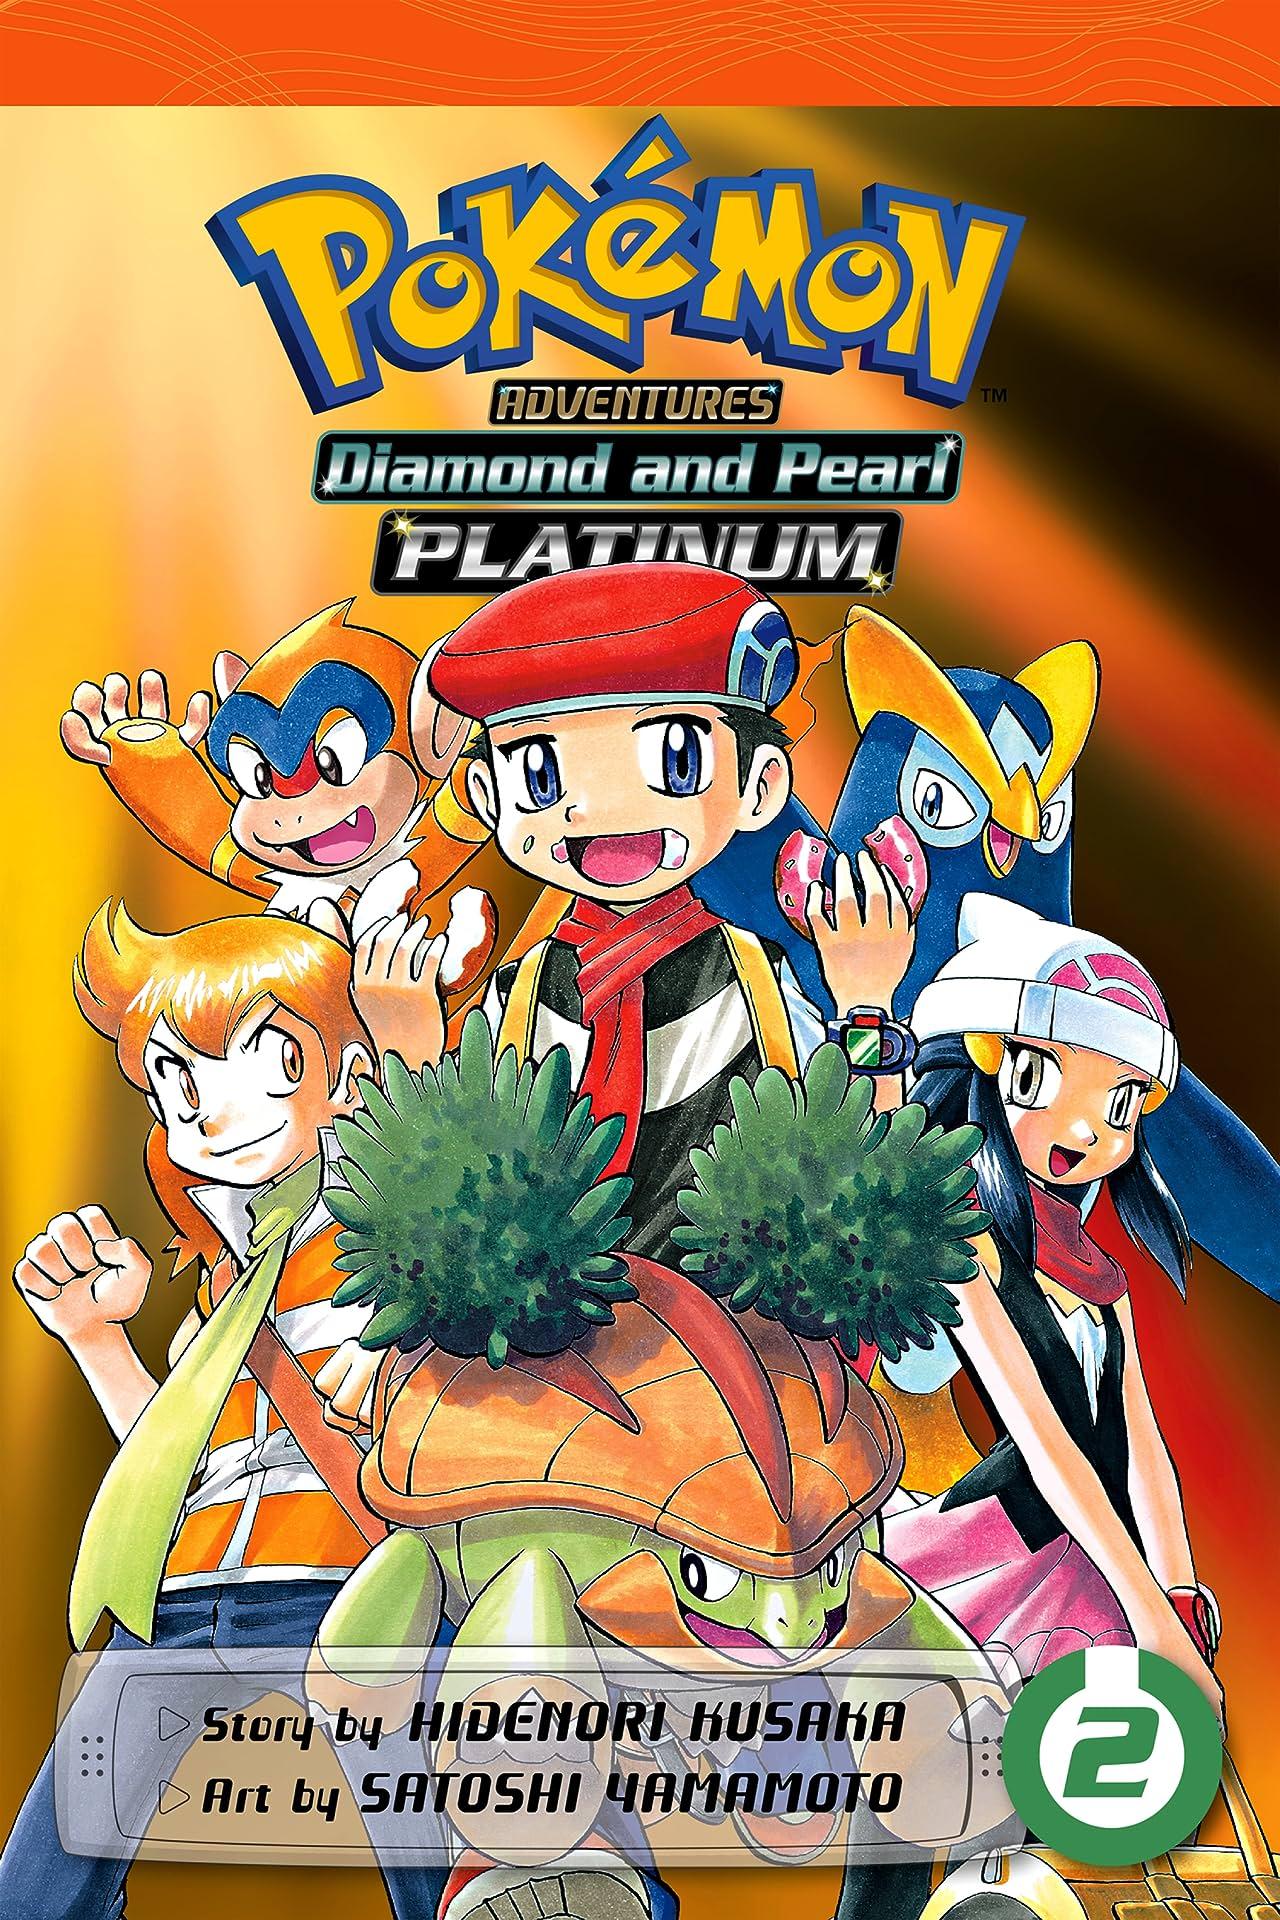 Pokémon Adventures: Diamond and Pearl/Platinum Vol. 2